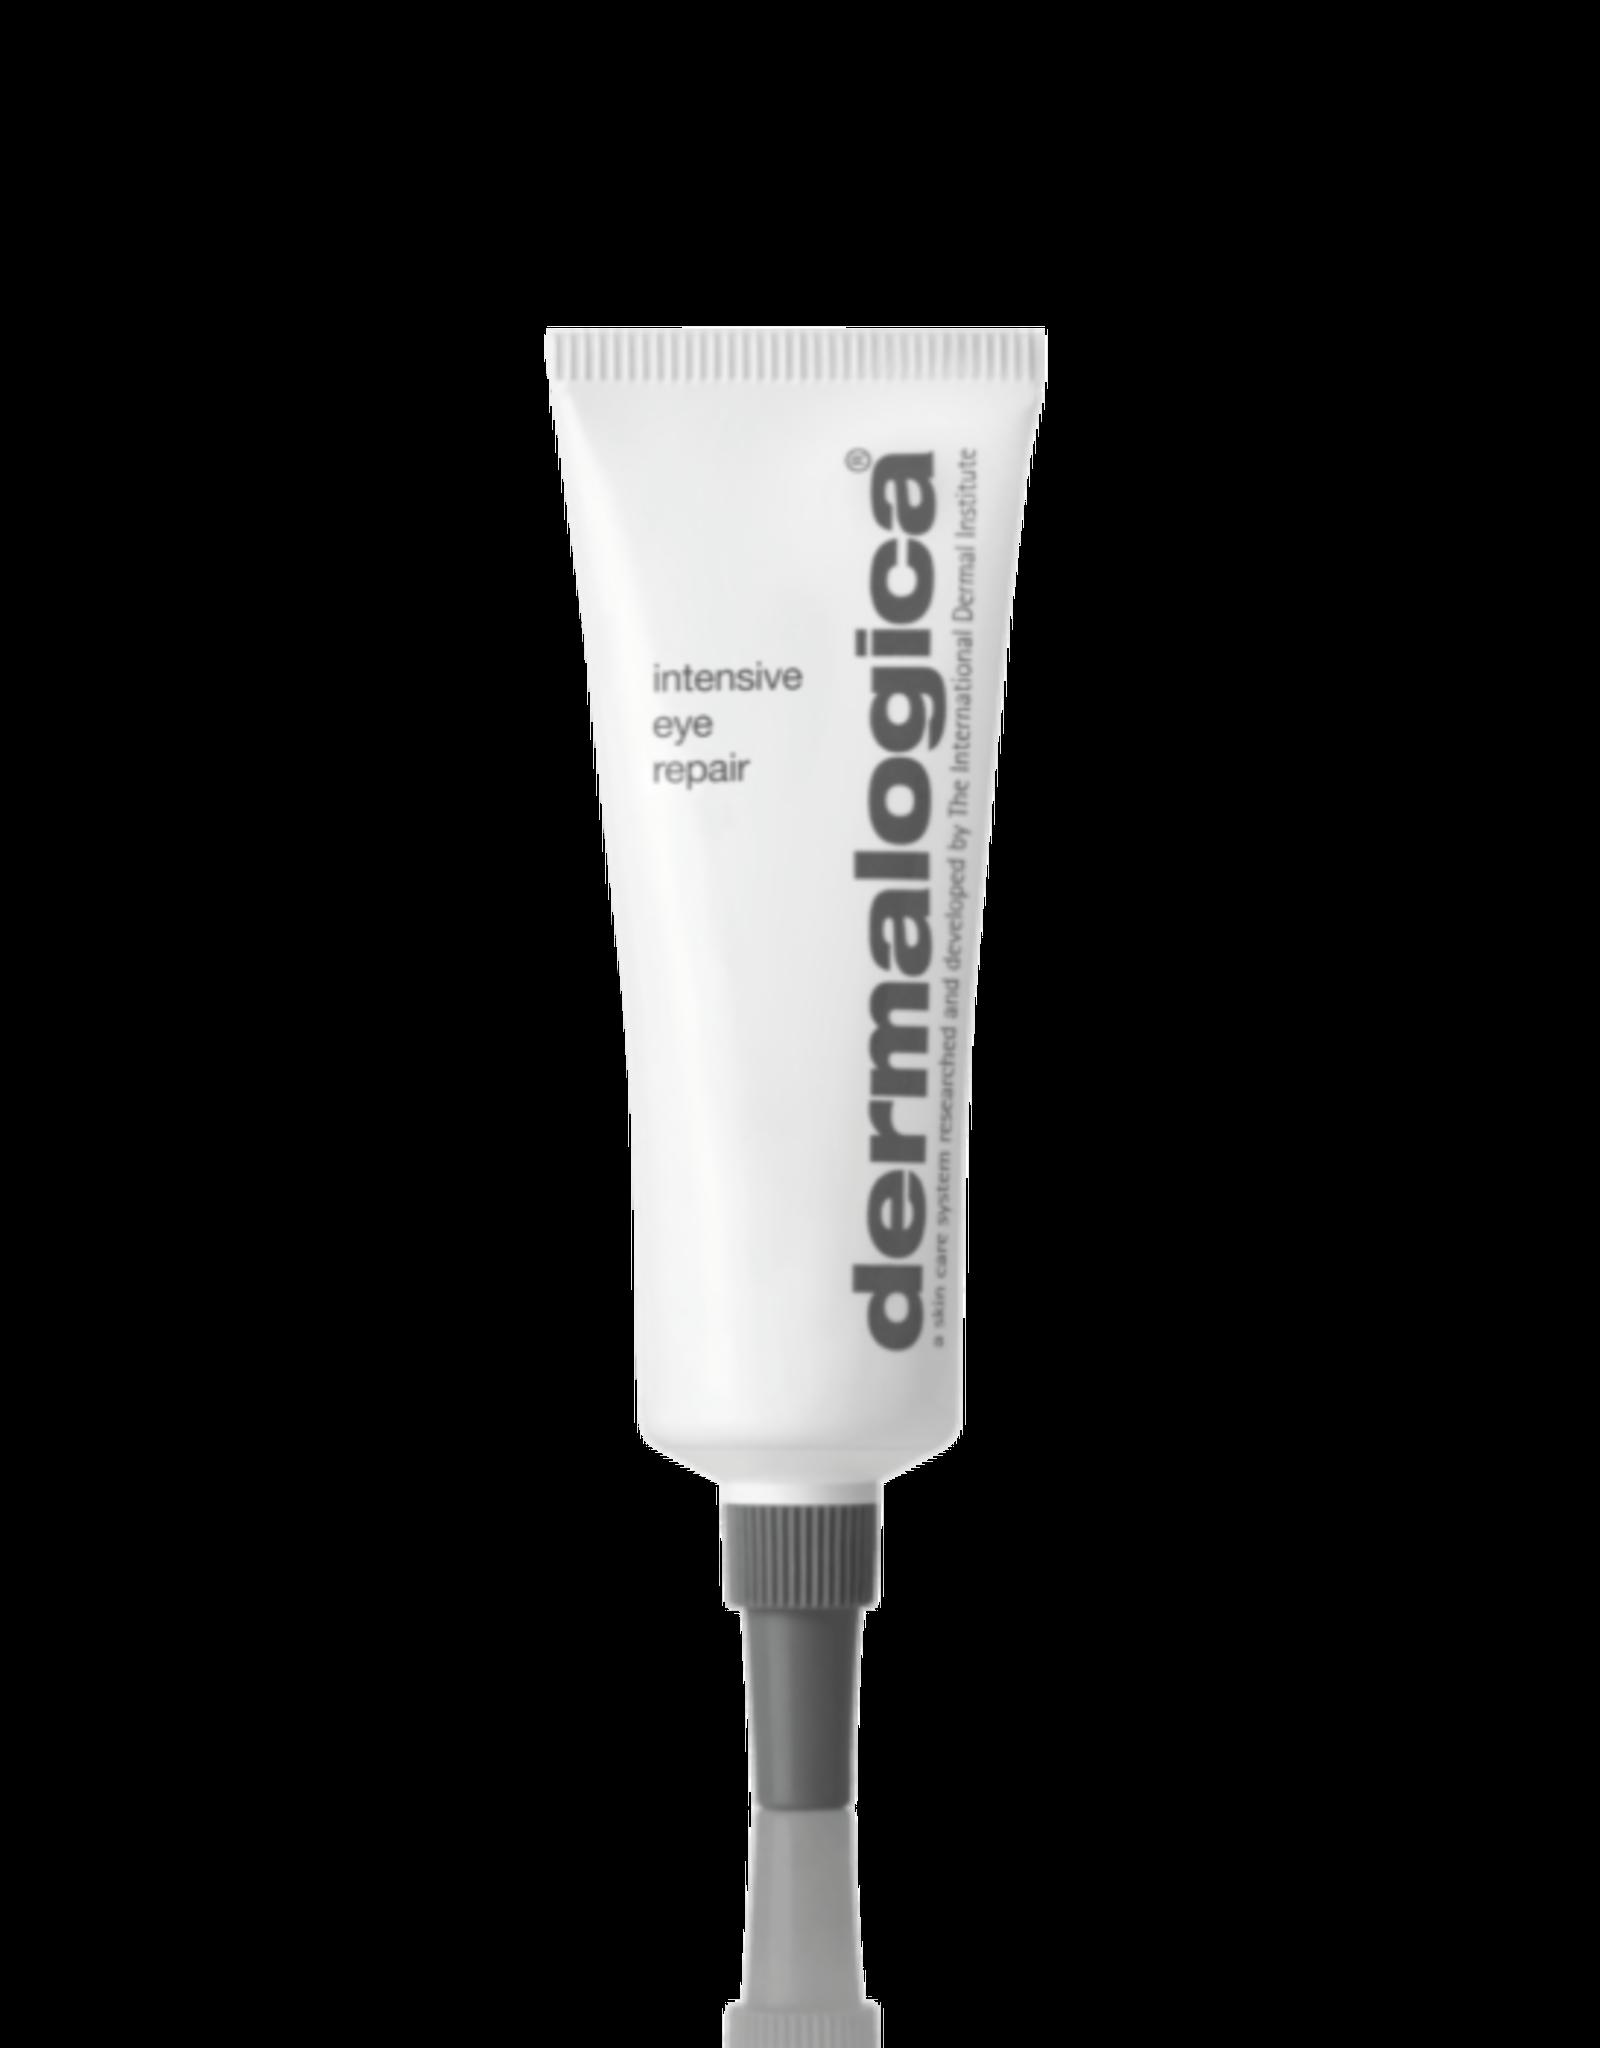 Dermalogica Intensive Eye Repair 15ml - Dermalogica